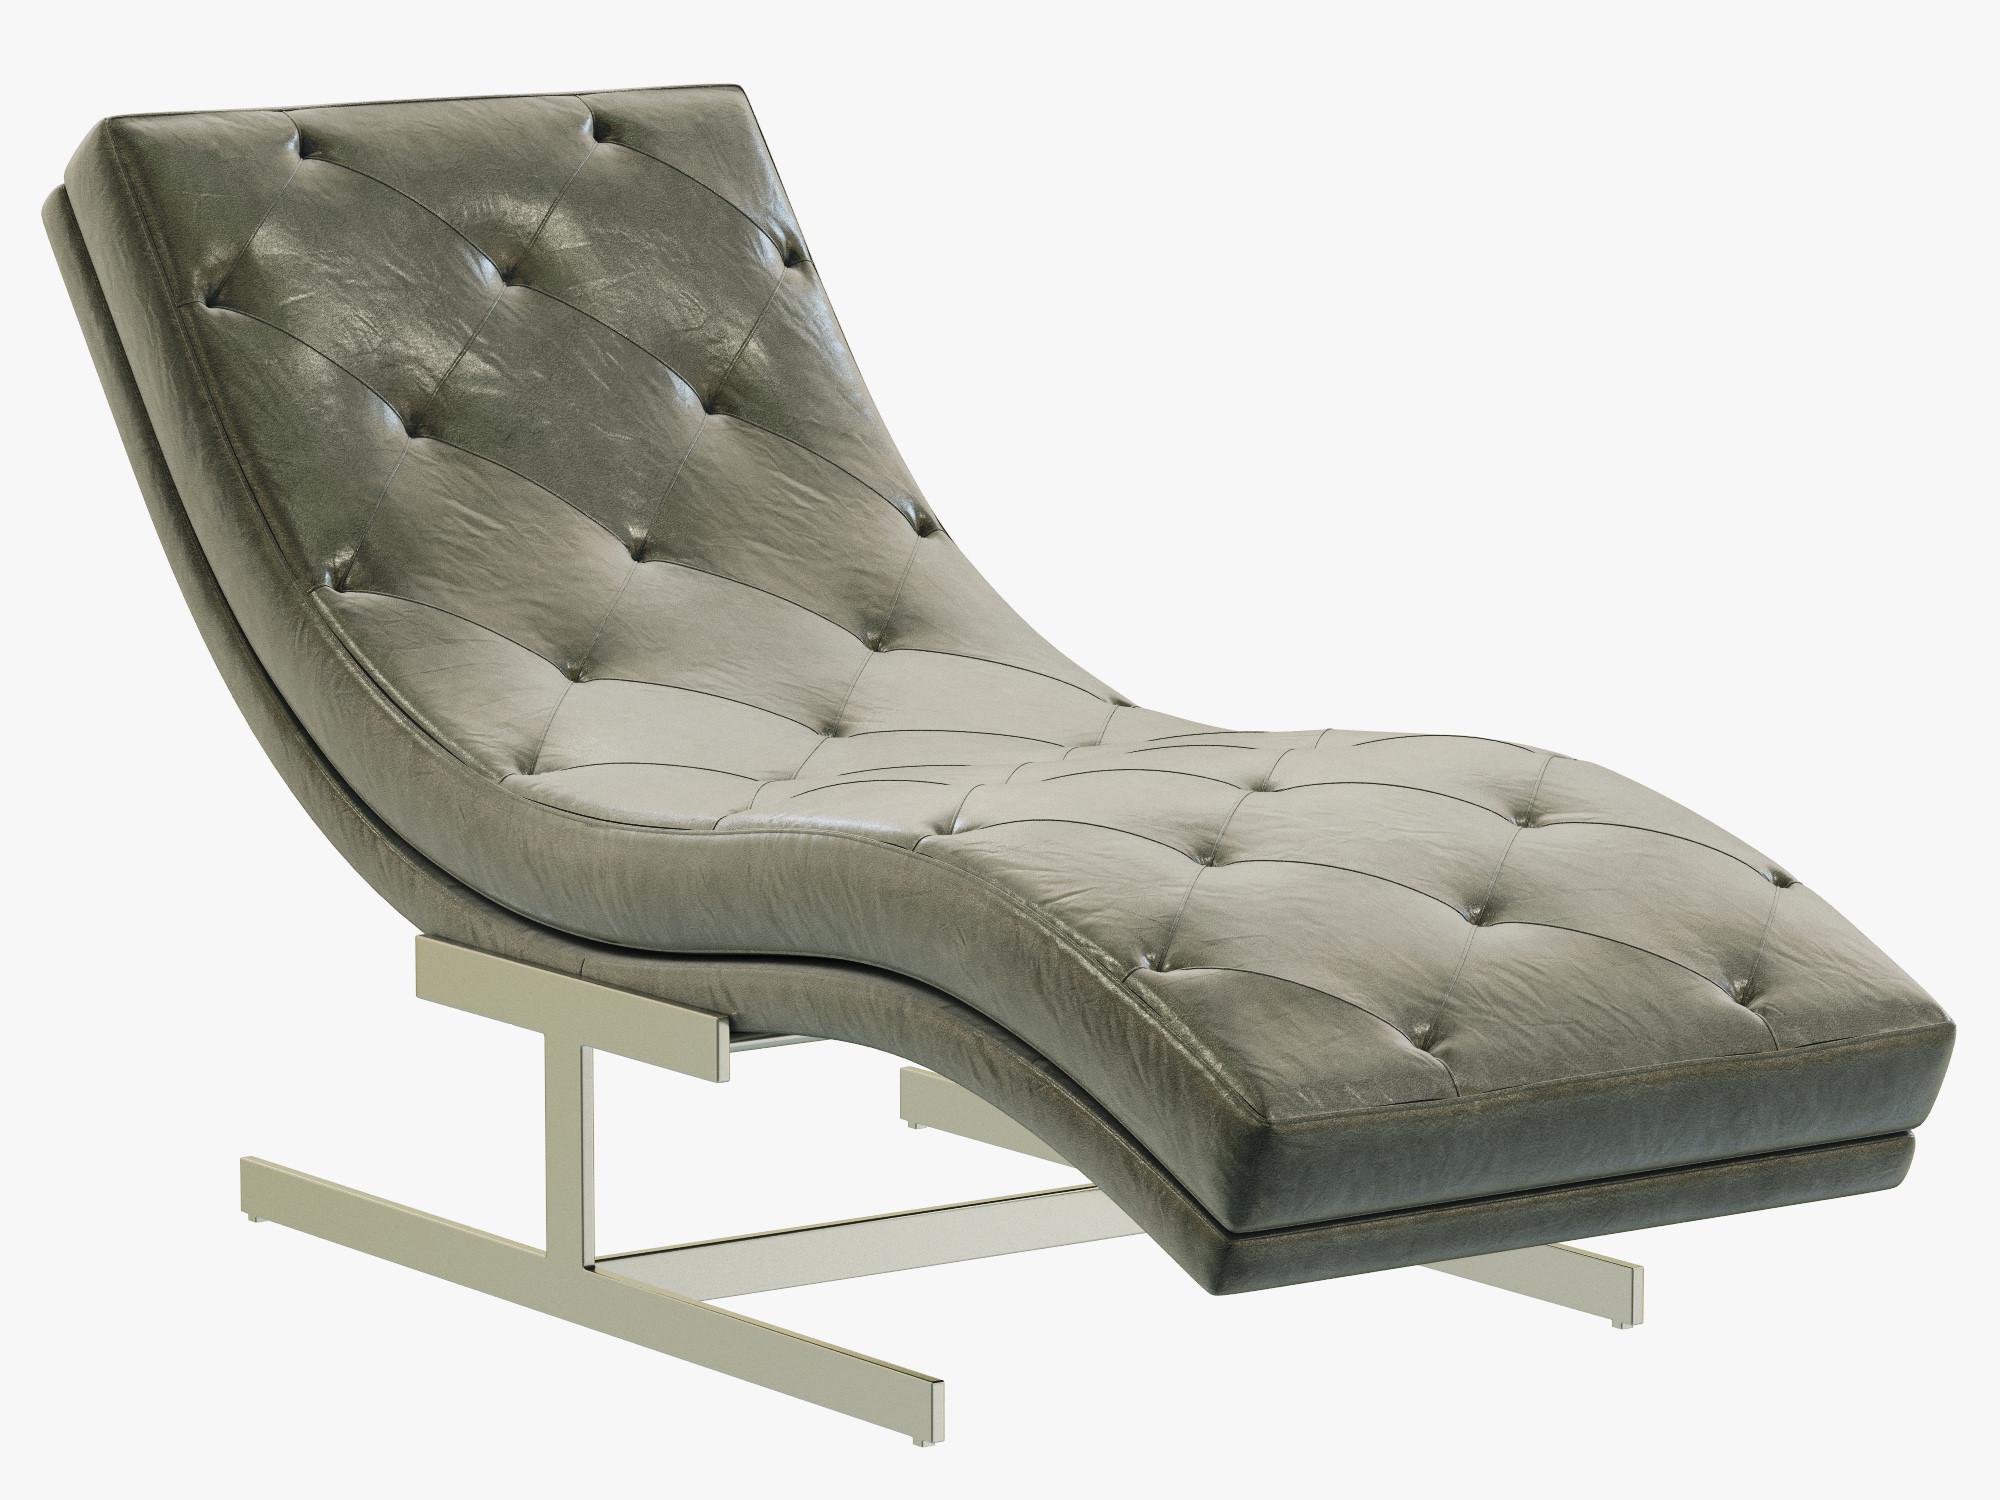 RH Modern Royce Leather Chaise2.jpg